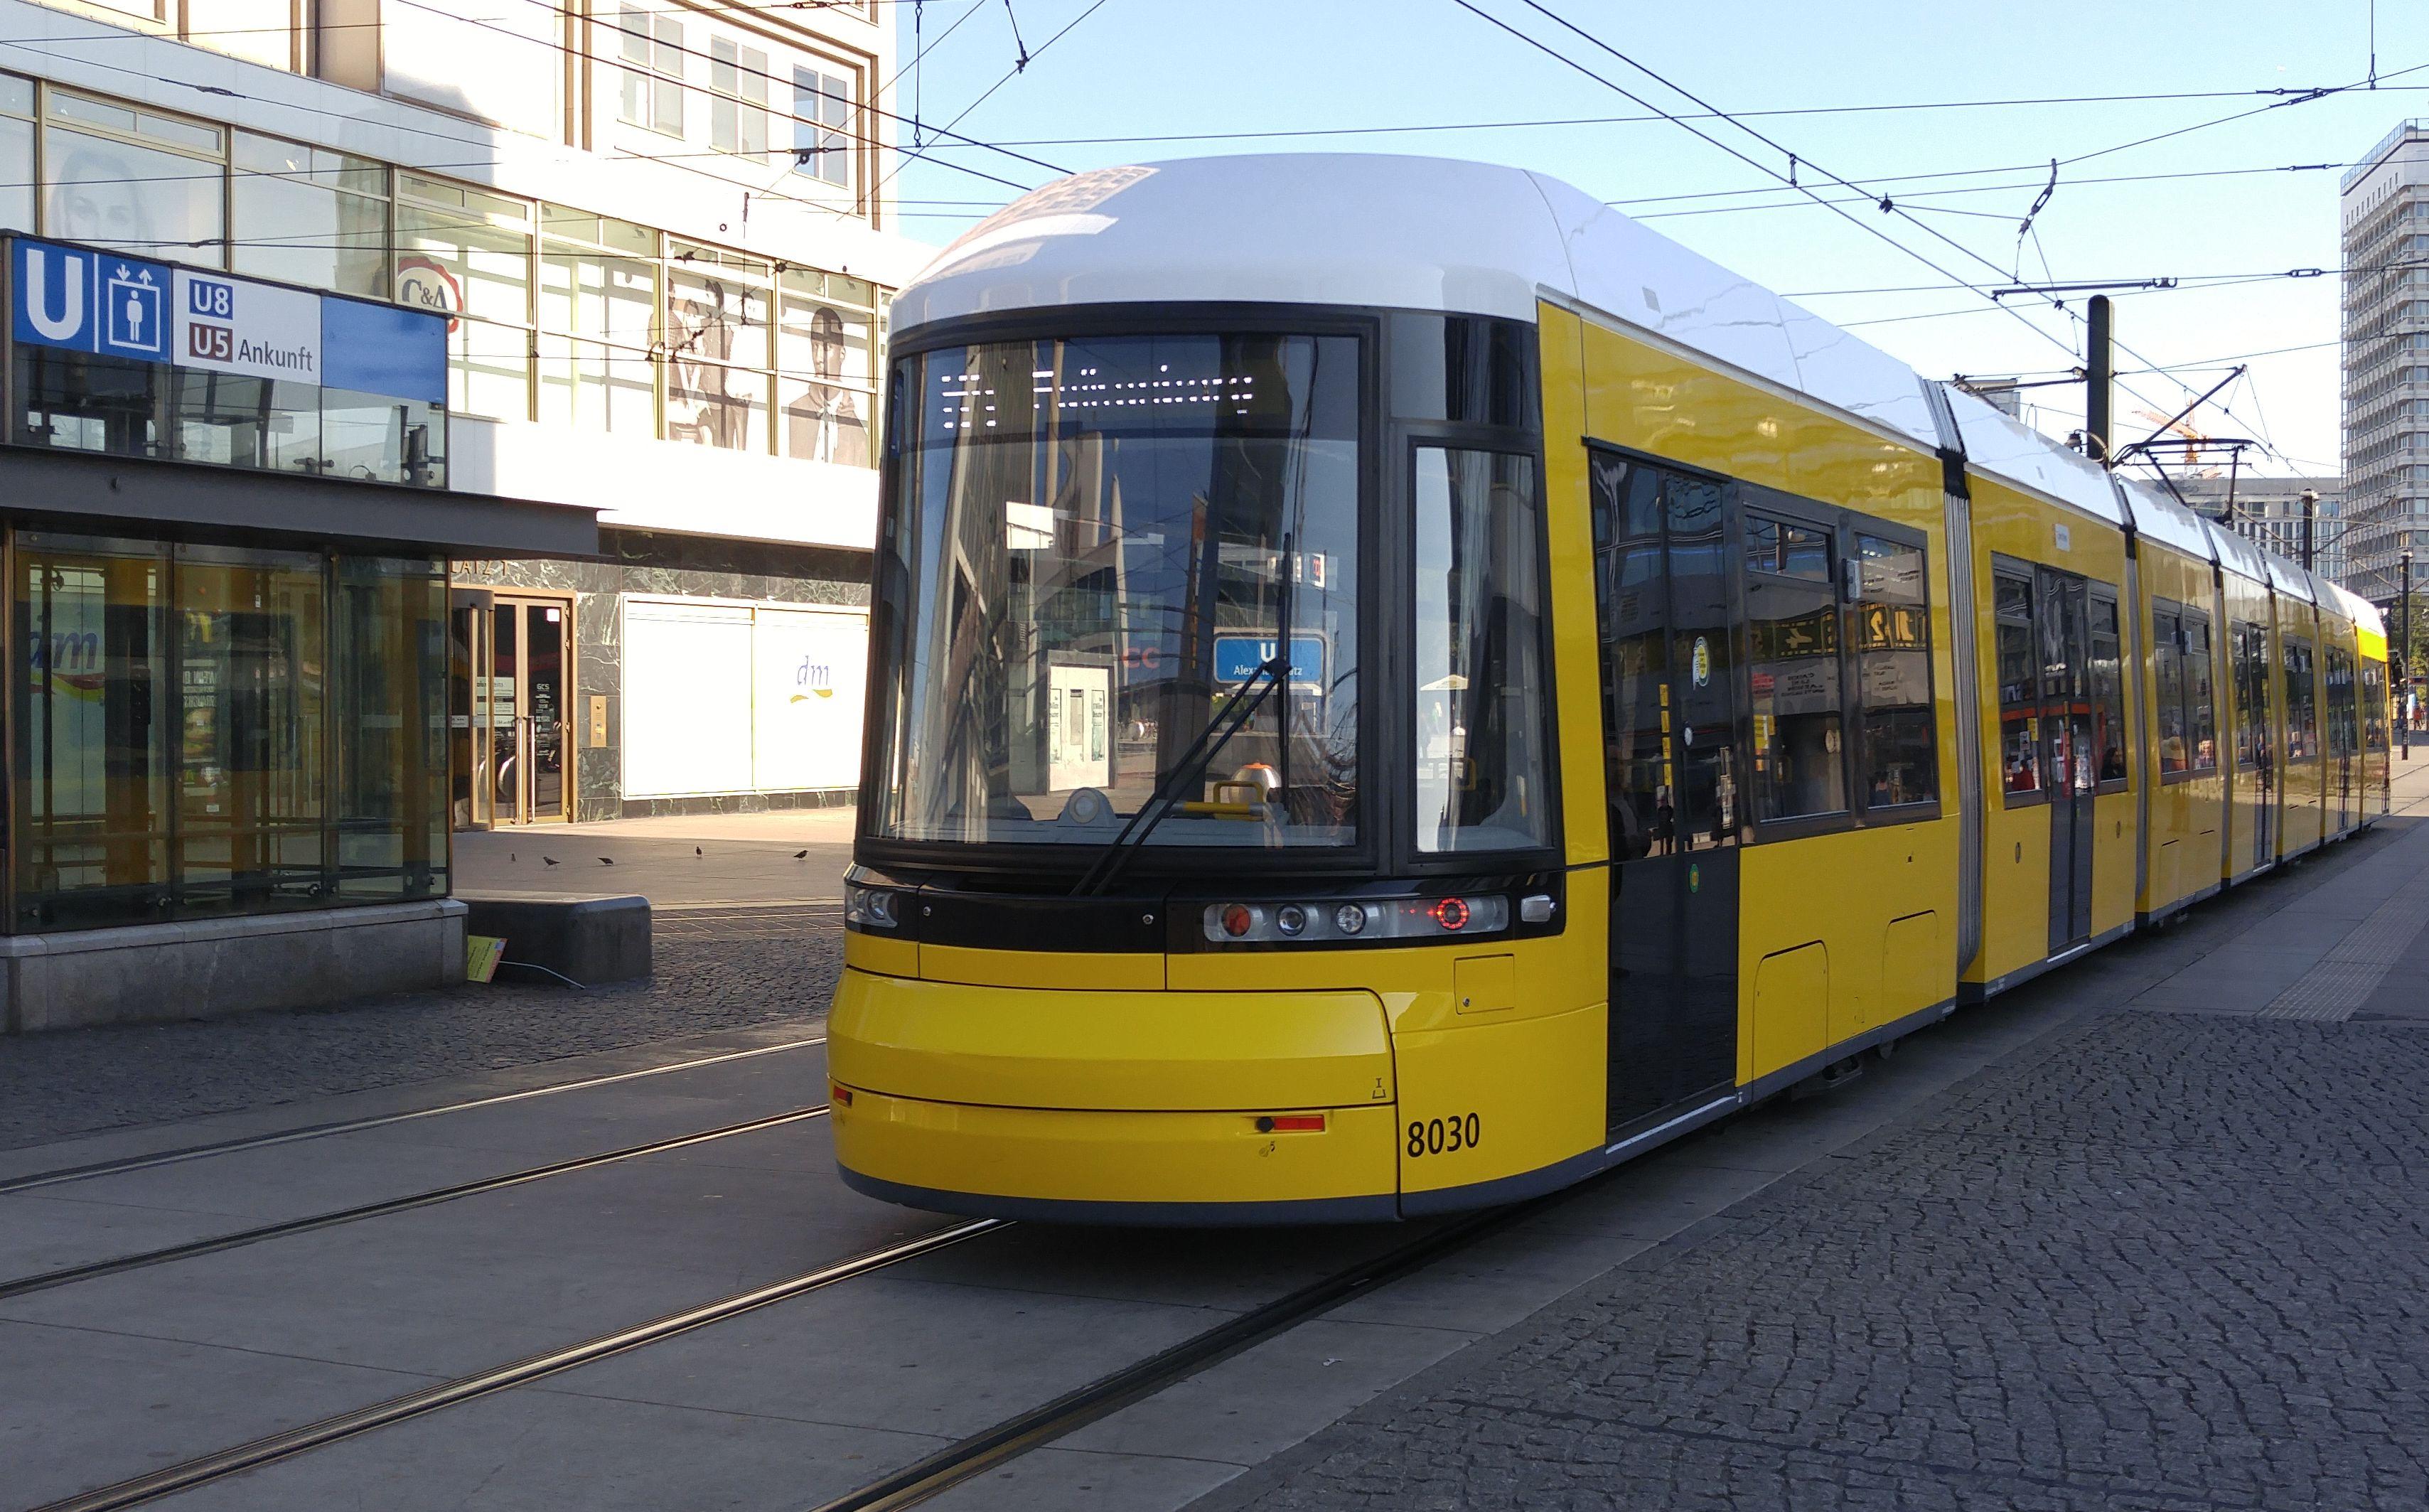 Foto: Straßenbahn 8030, Typ Flexity ERL, Alexanderplatz, 2016